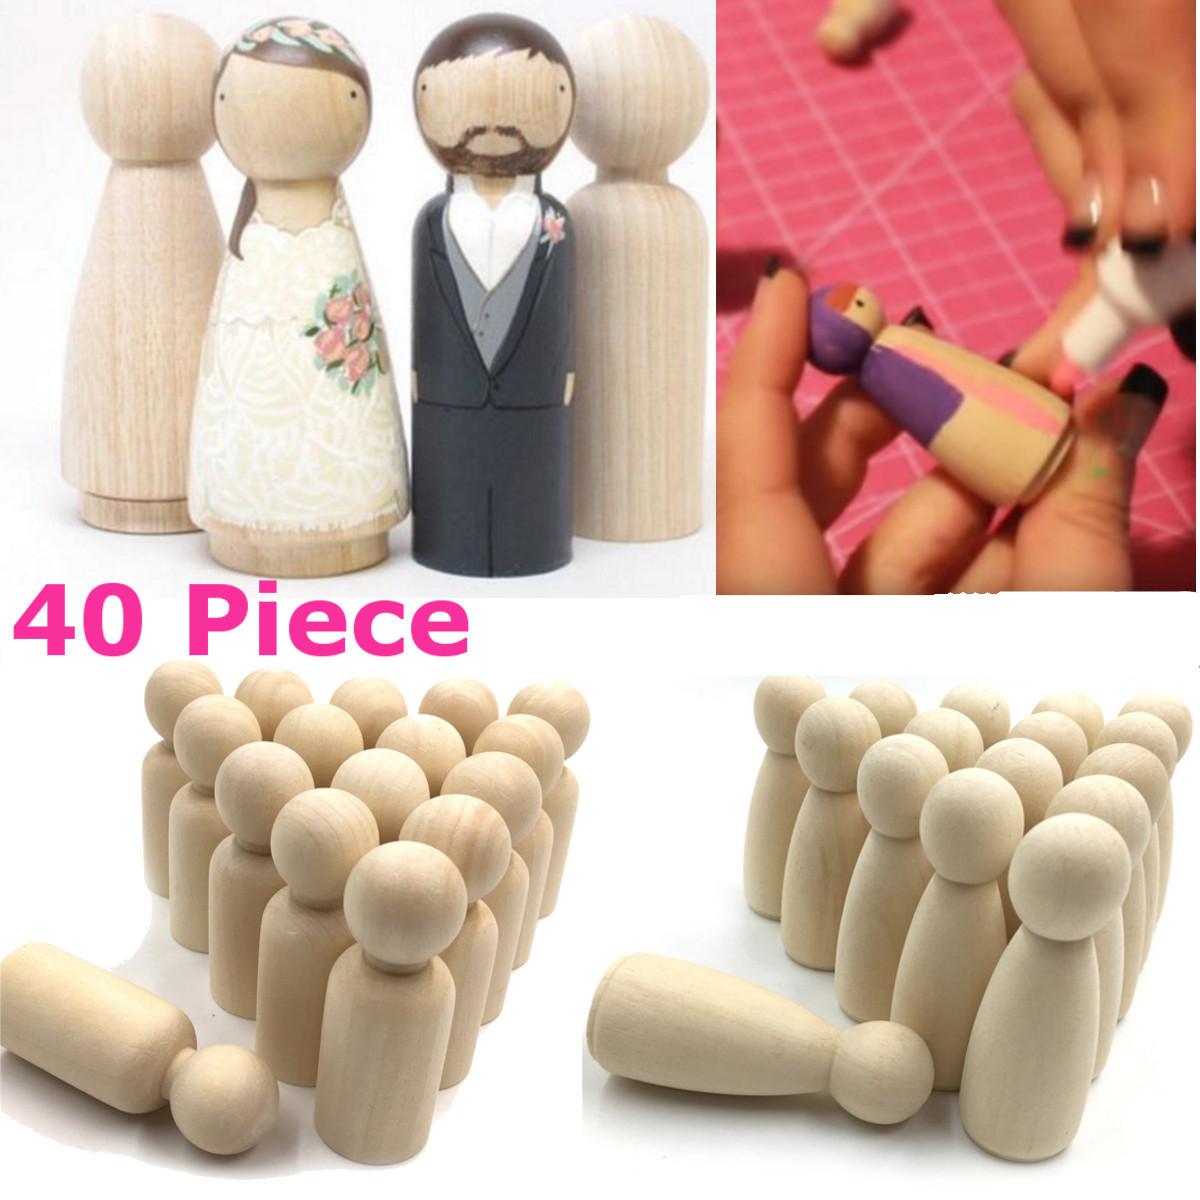 20Pcs Natural Unfinished Wooden Girl Boy Peg Doll Wedding Cake Toppers DIY Craft